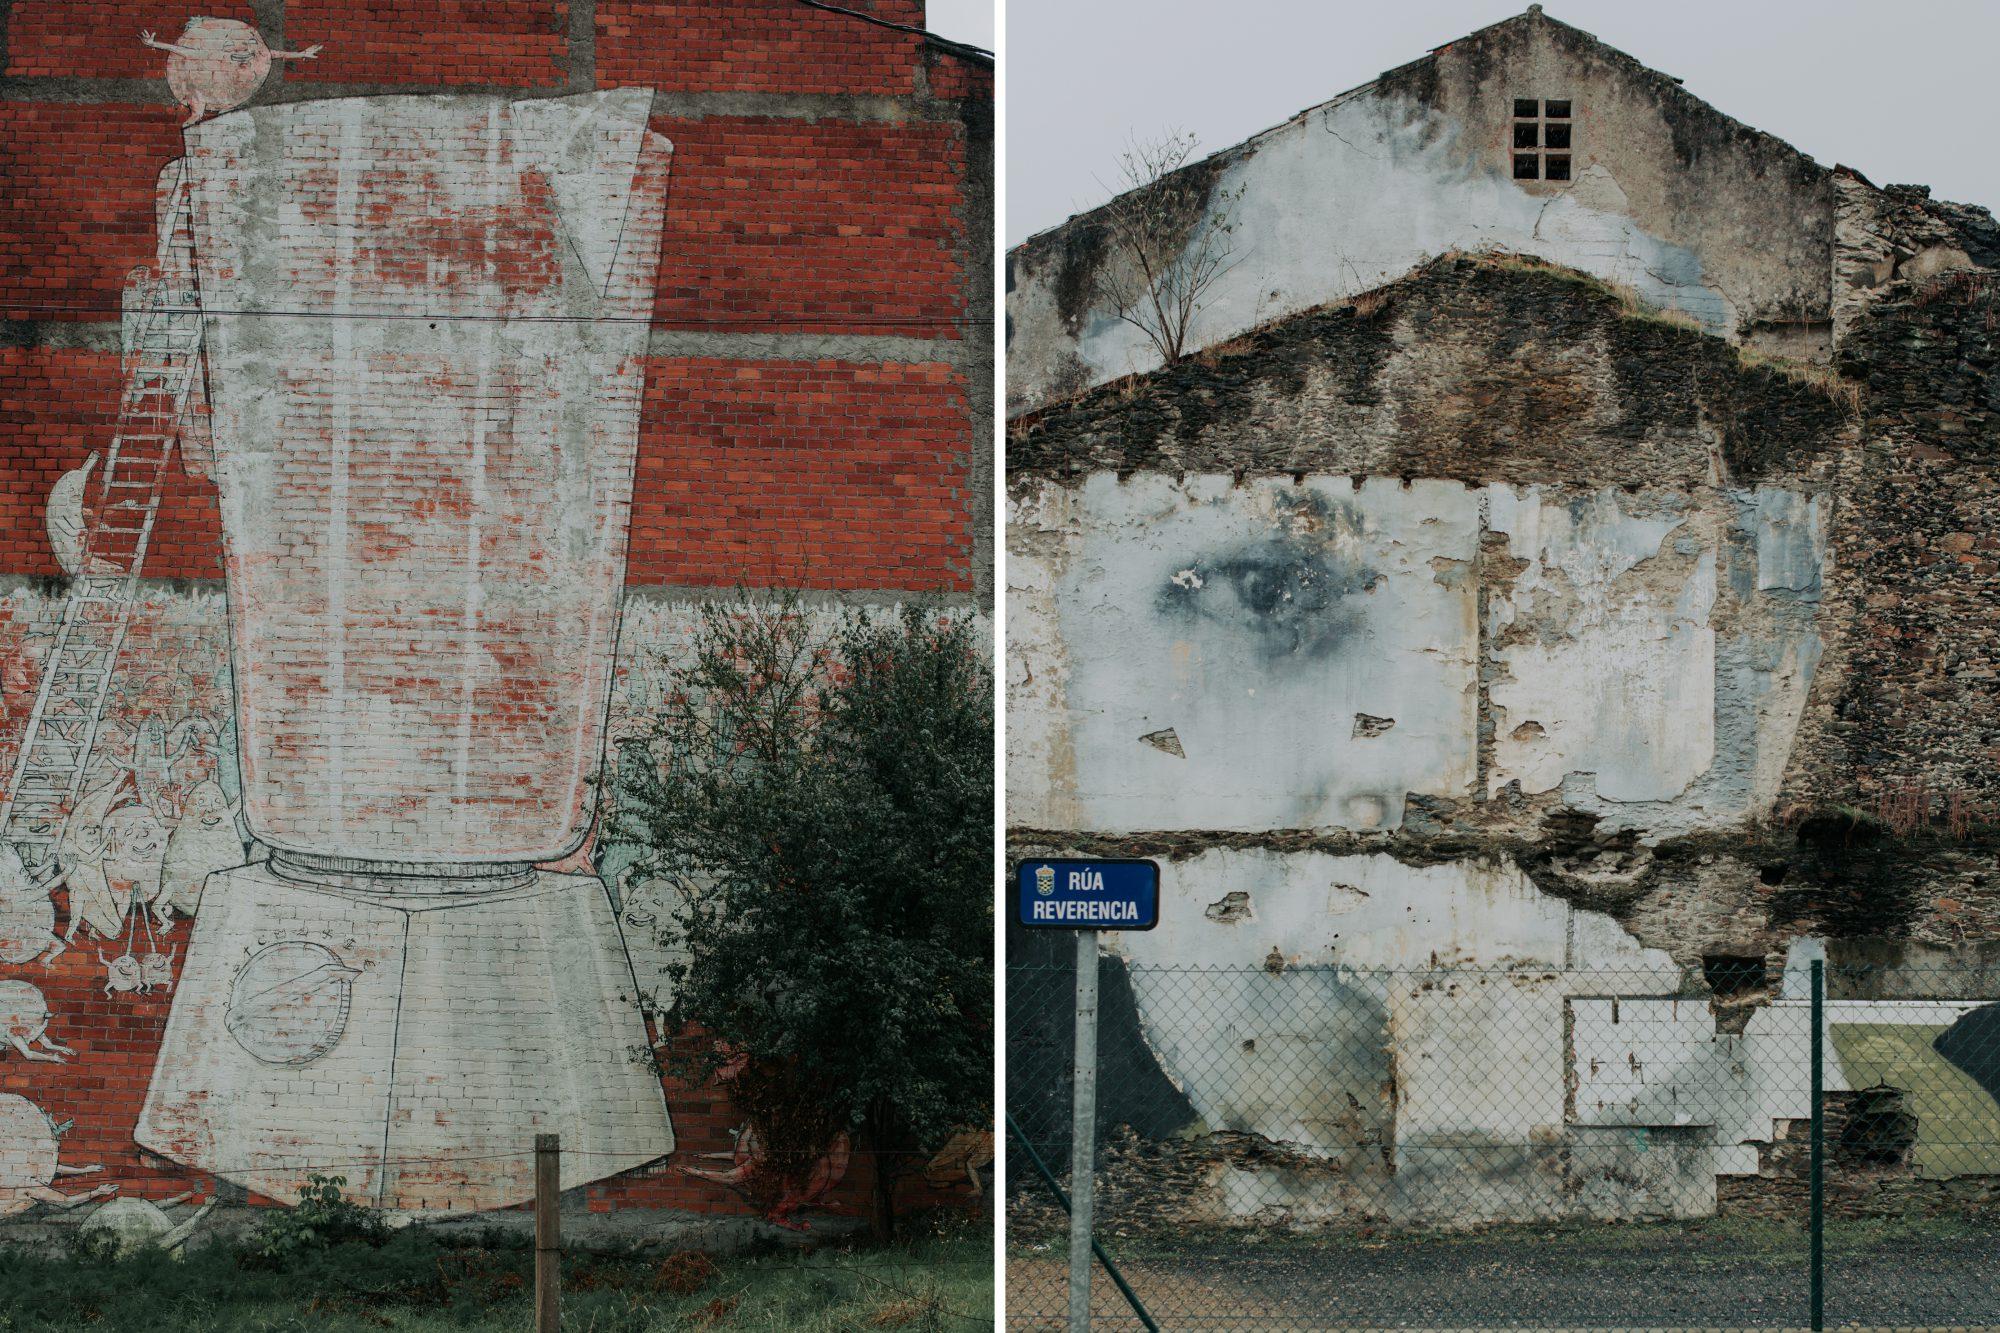 Street art en Ordes: 'Galicia caníbal', del italiano Blu y 'Memoria' del argentino Bosoletti